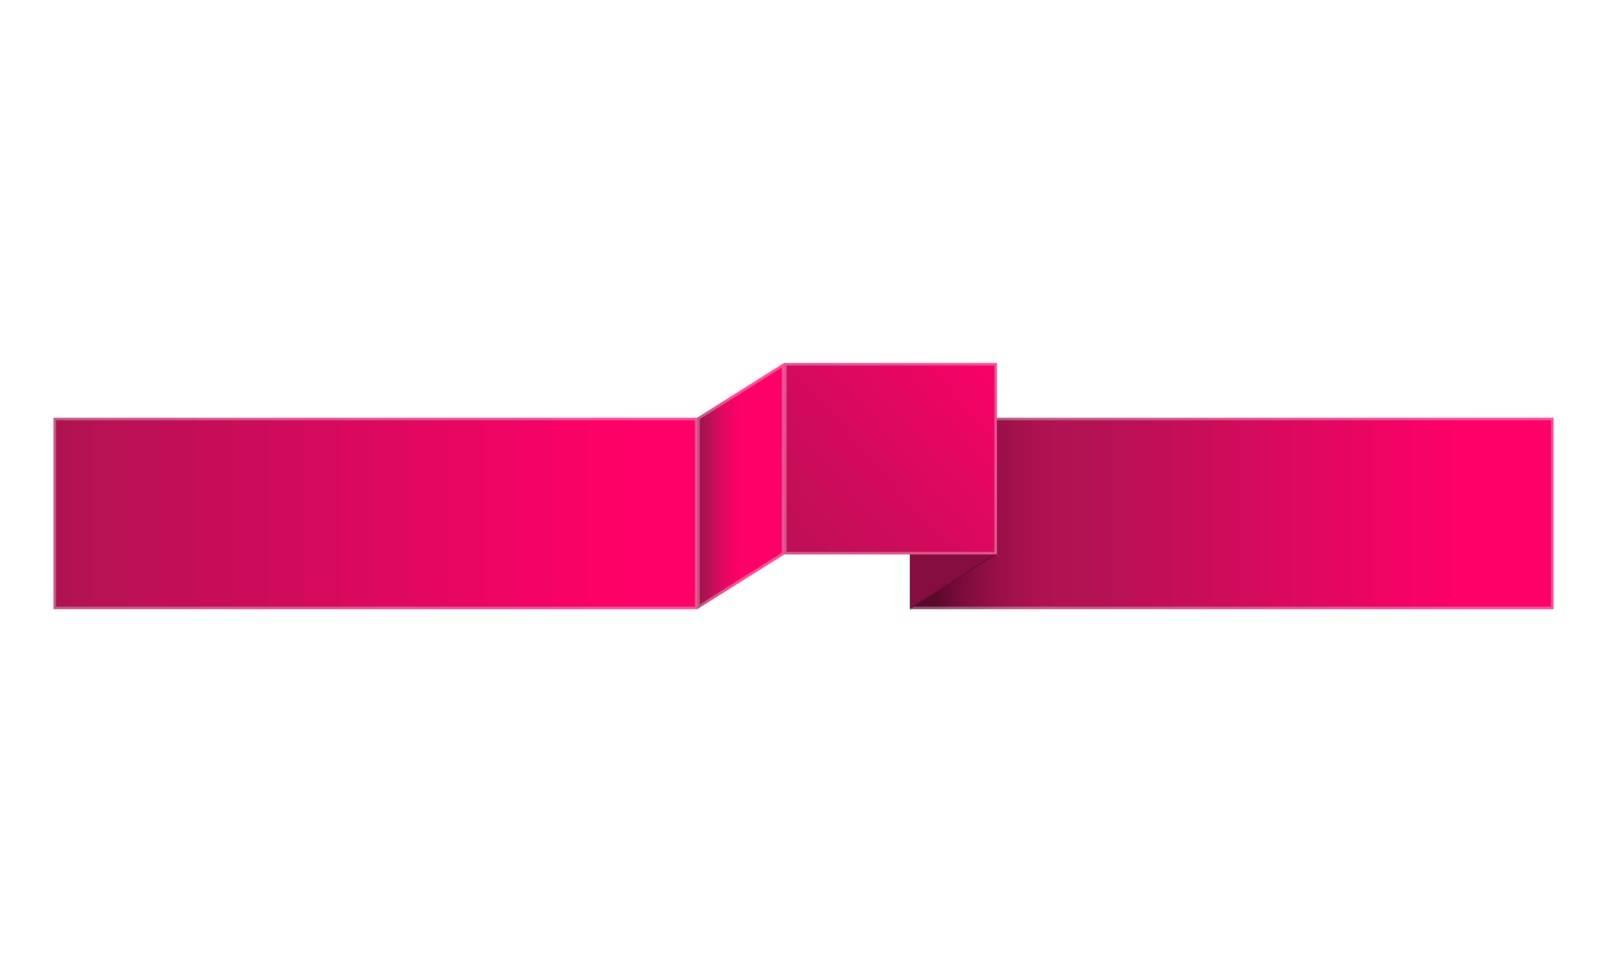 The blank modern style violet ribbon